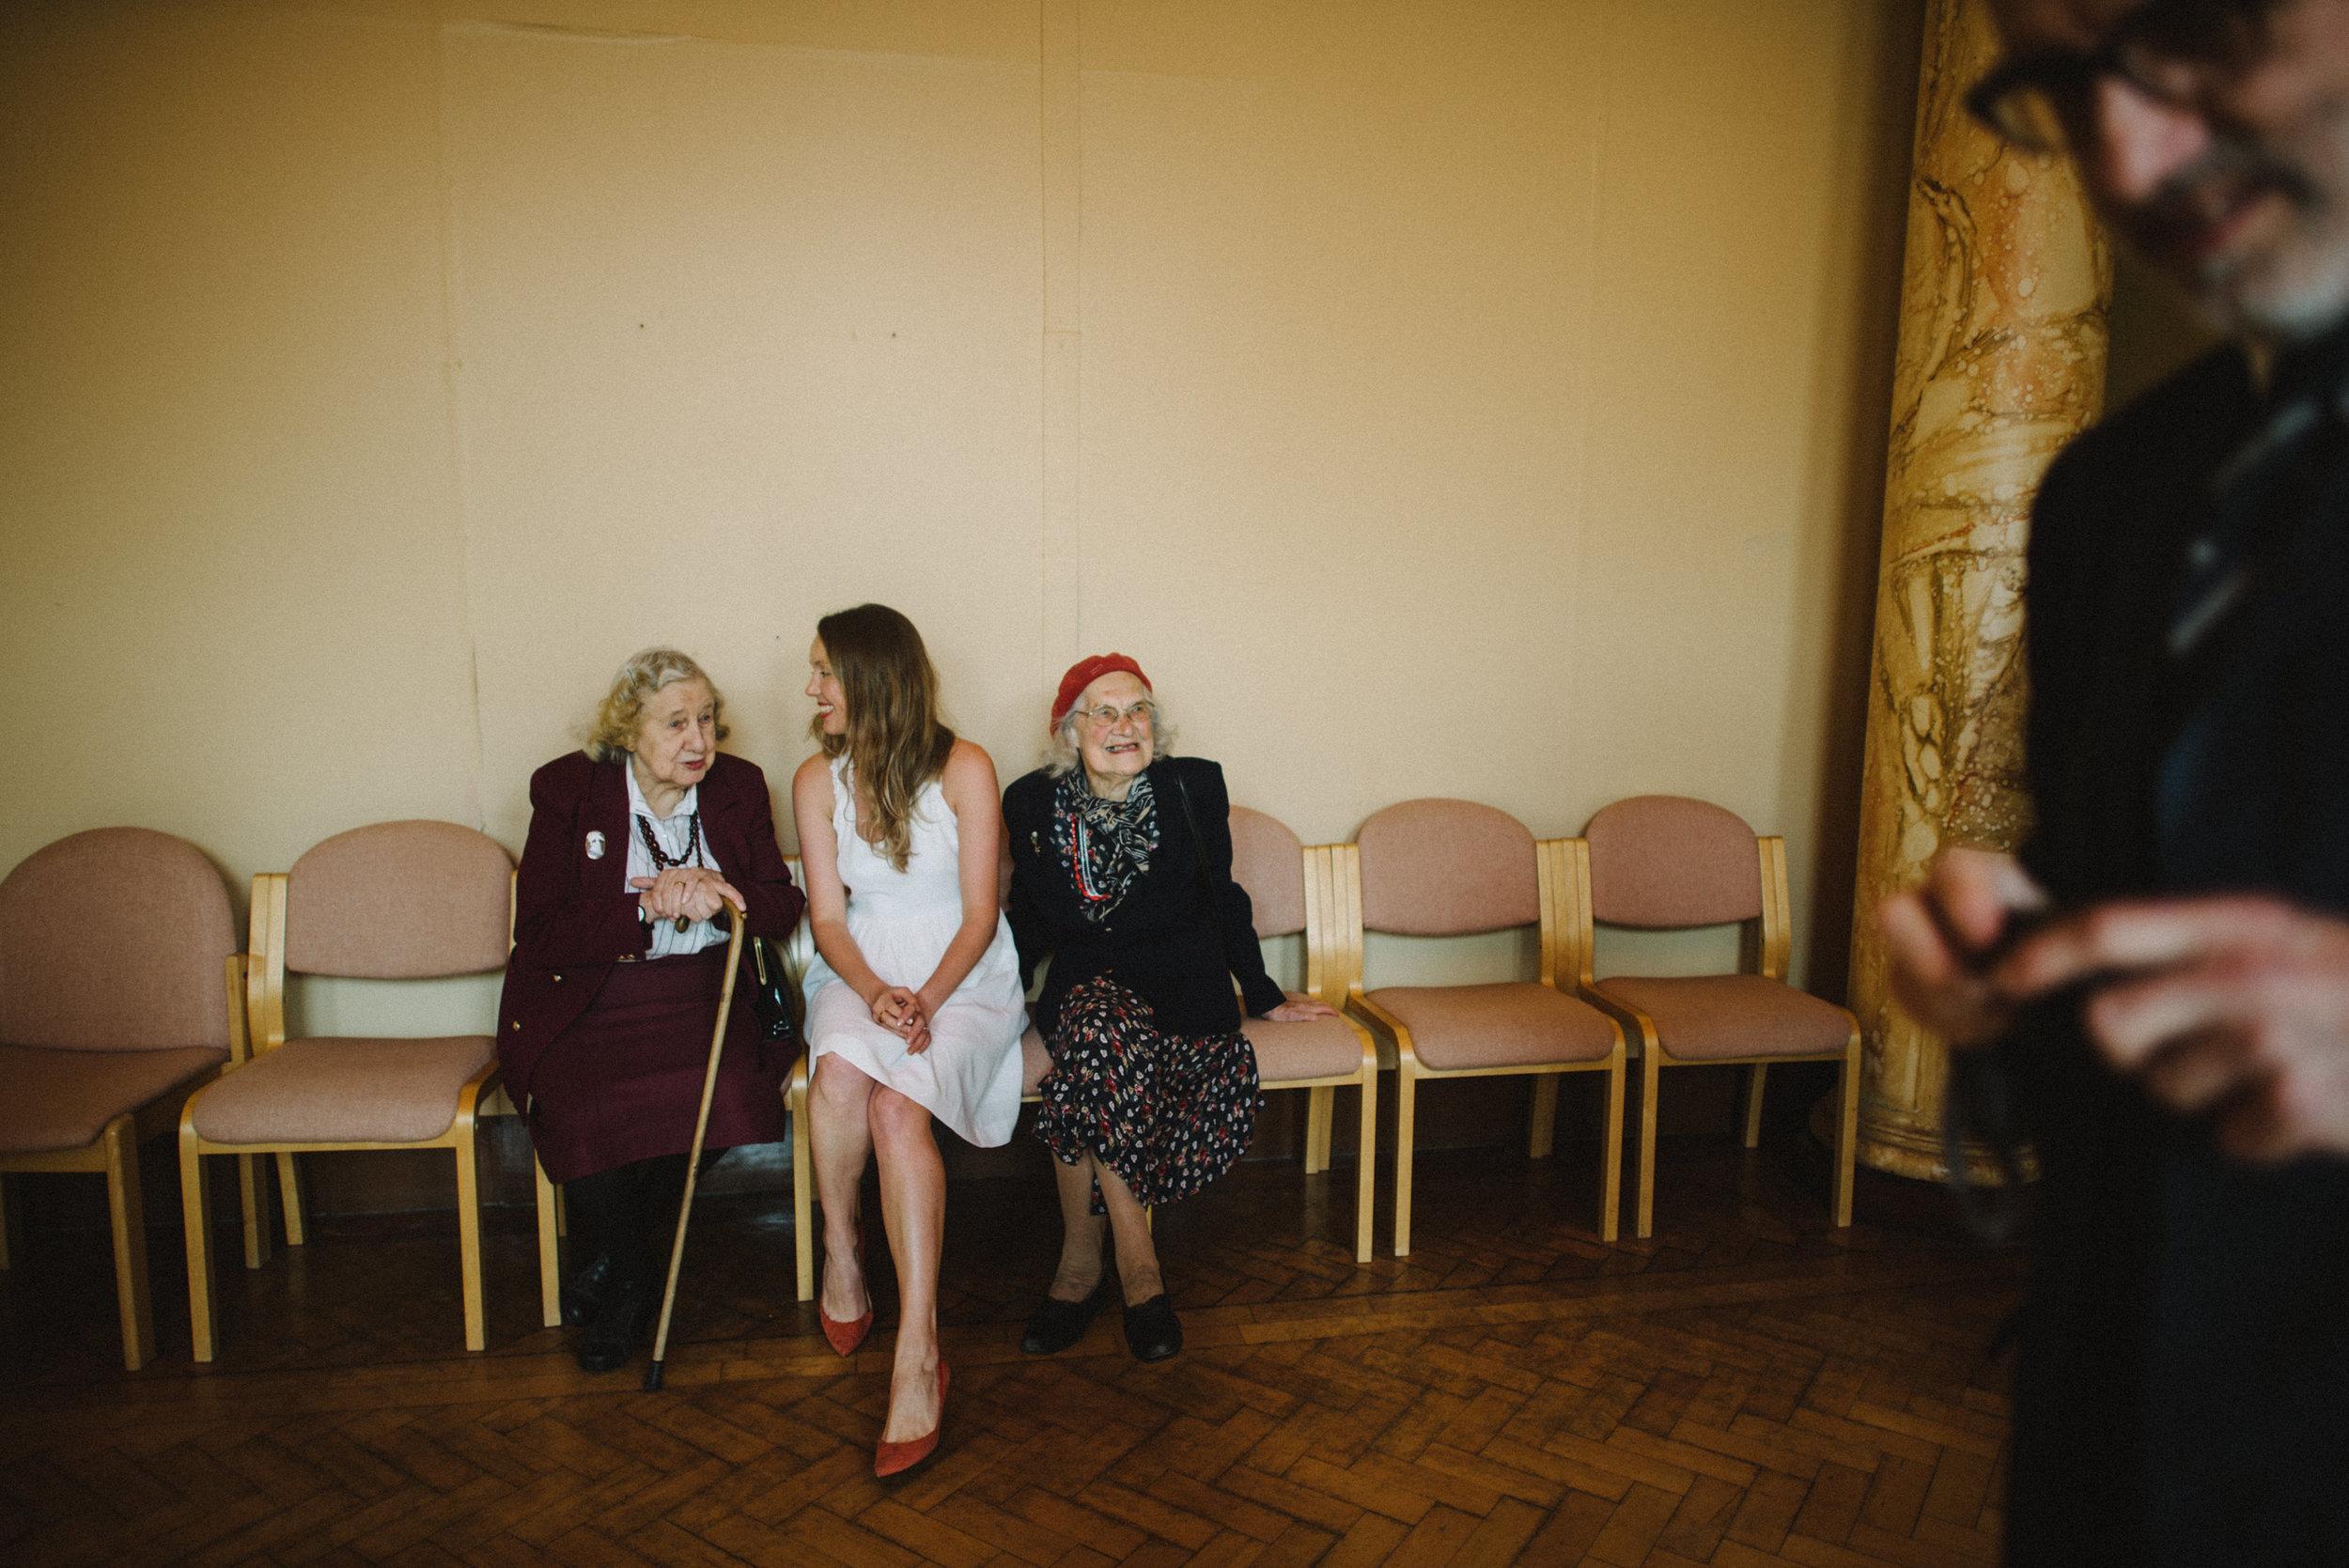 0123-LISA-DEVINE-PHOTOGRAPHY-ALTERNATIVE-WEDDING-PHOTOGRAPHY-SCOTLAND-DESTINATION-WEDDINGS-GLASGOW-WEDDINGS-COOL-WEDDINGS-STYLISH-WEDDINGS.JPG